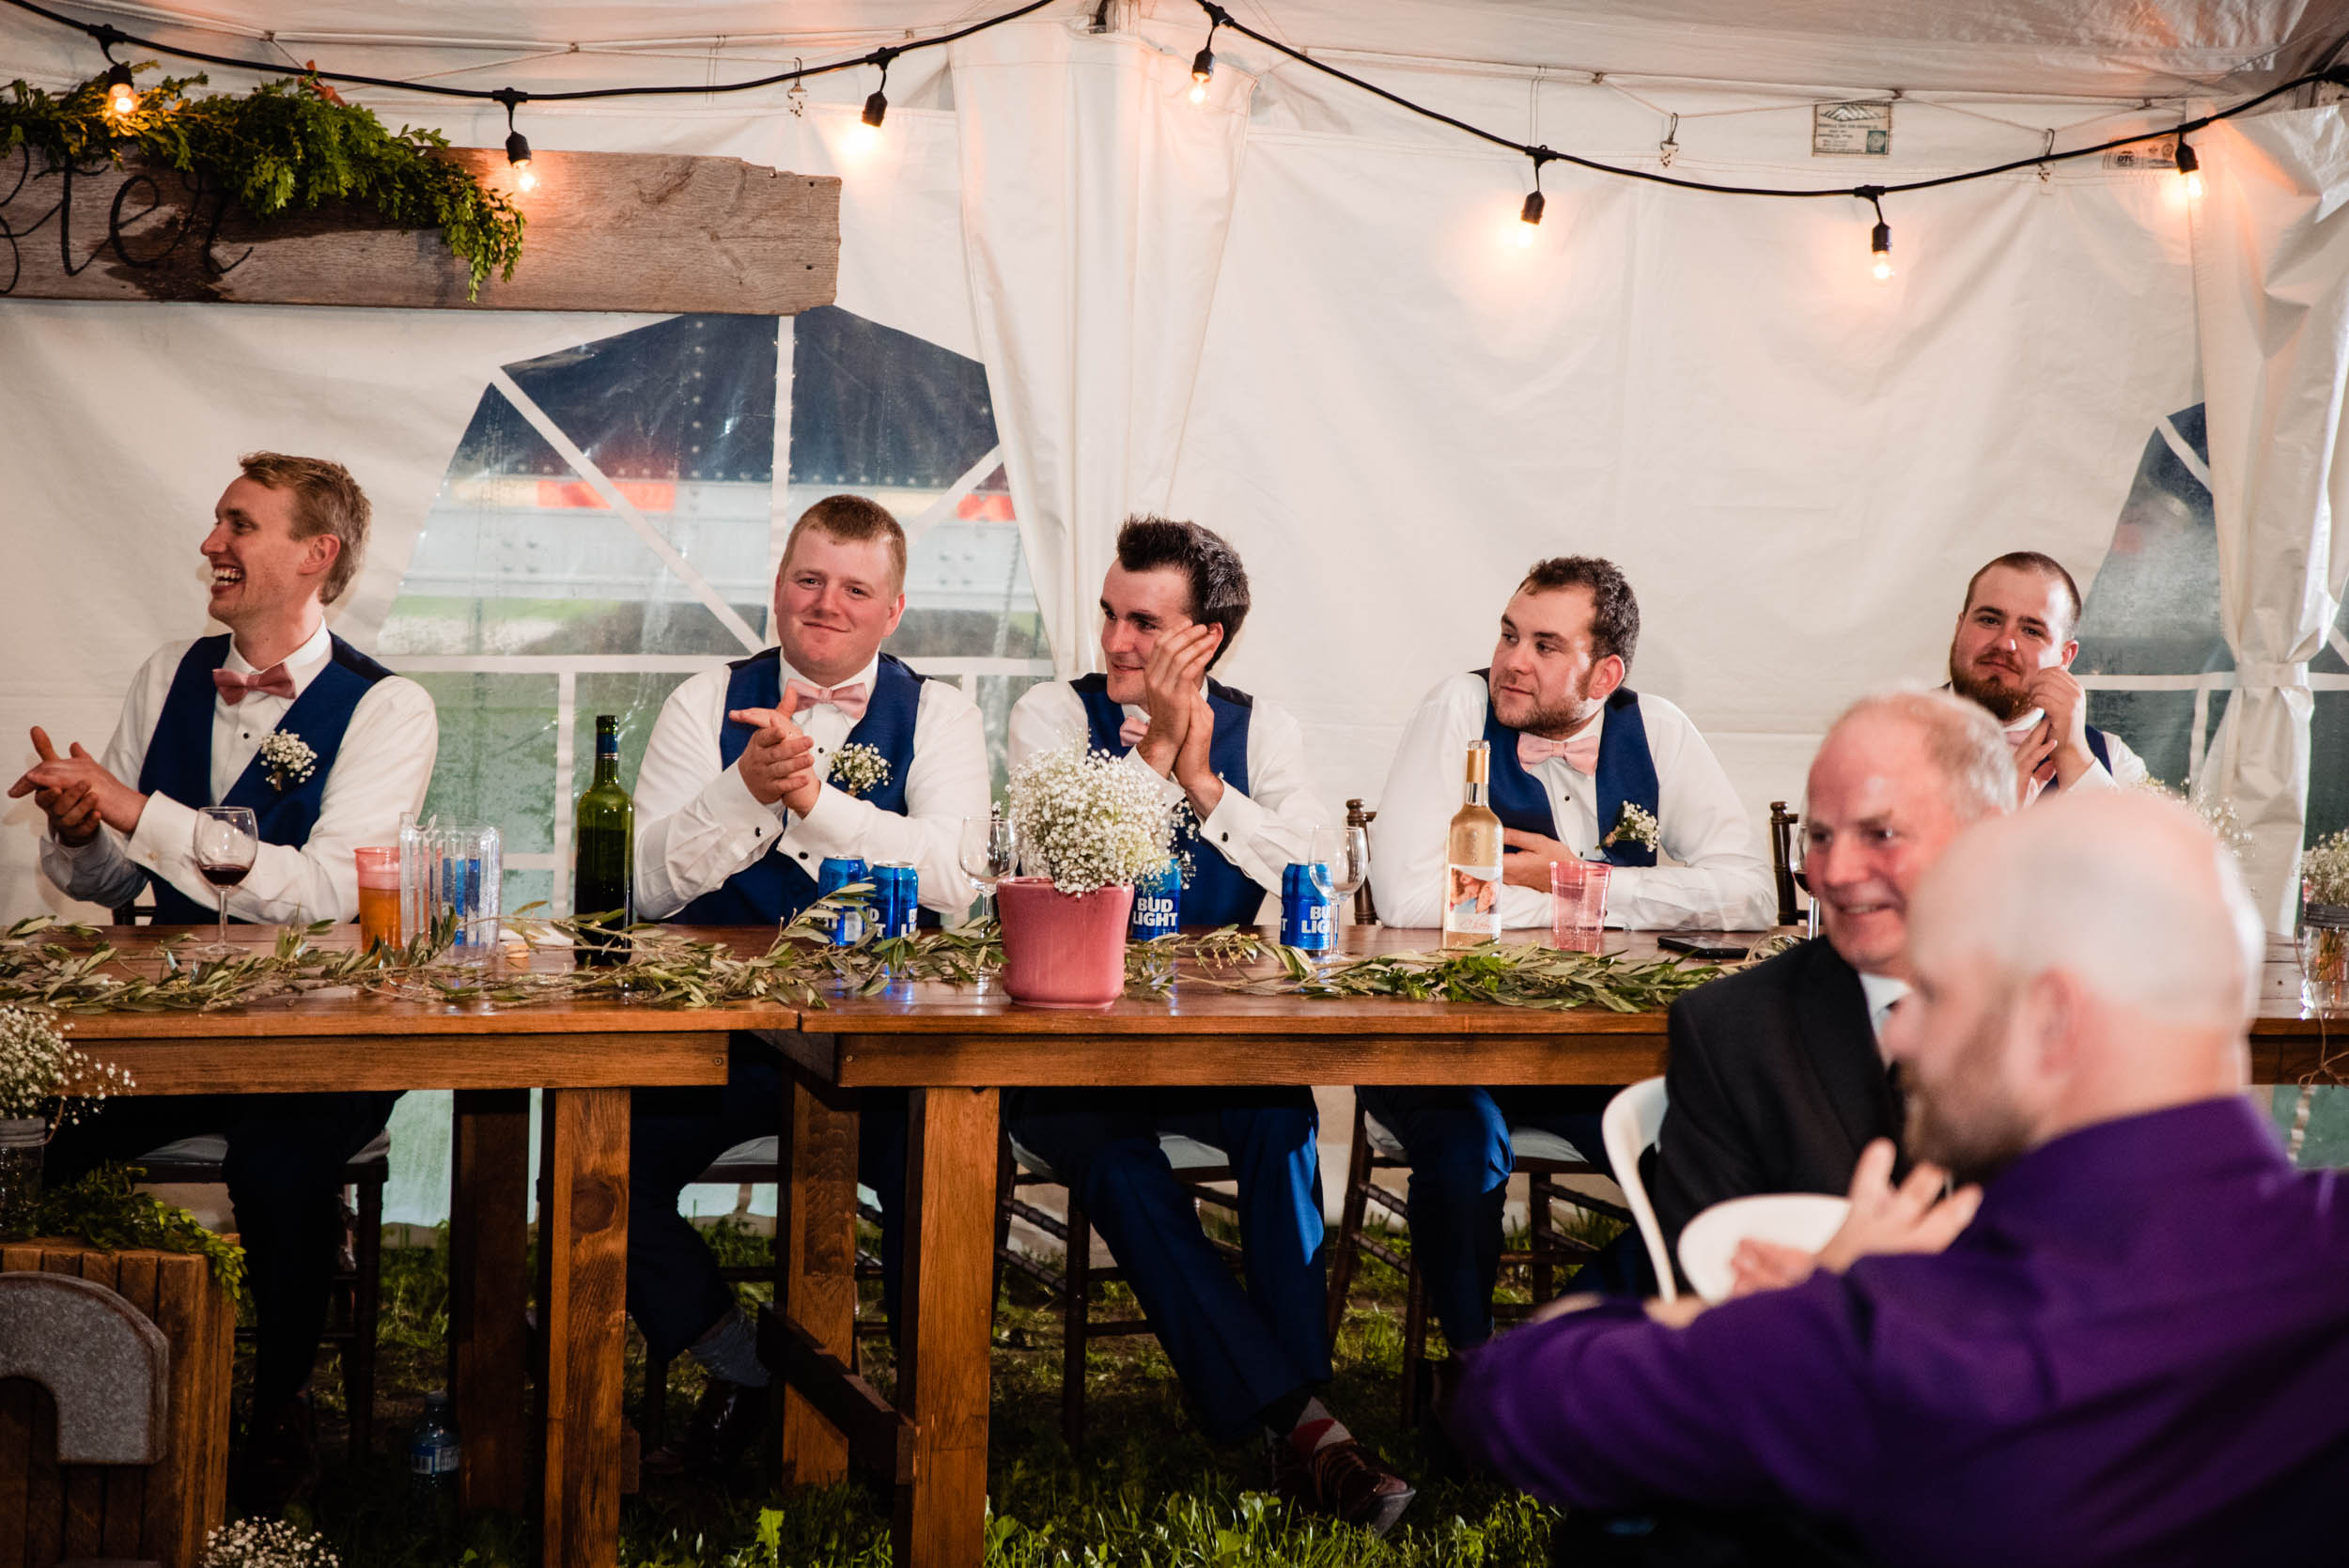 london-ontario-wedding-photography-farm-tent (109).jpg